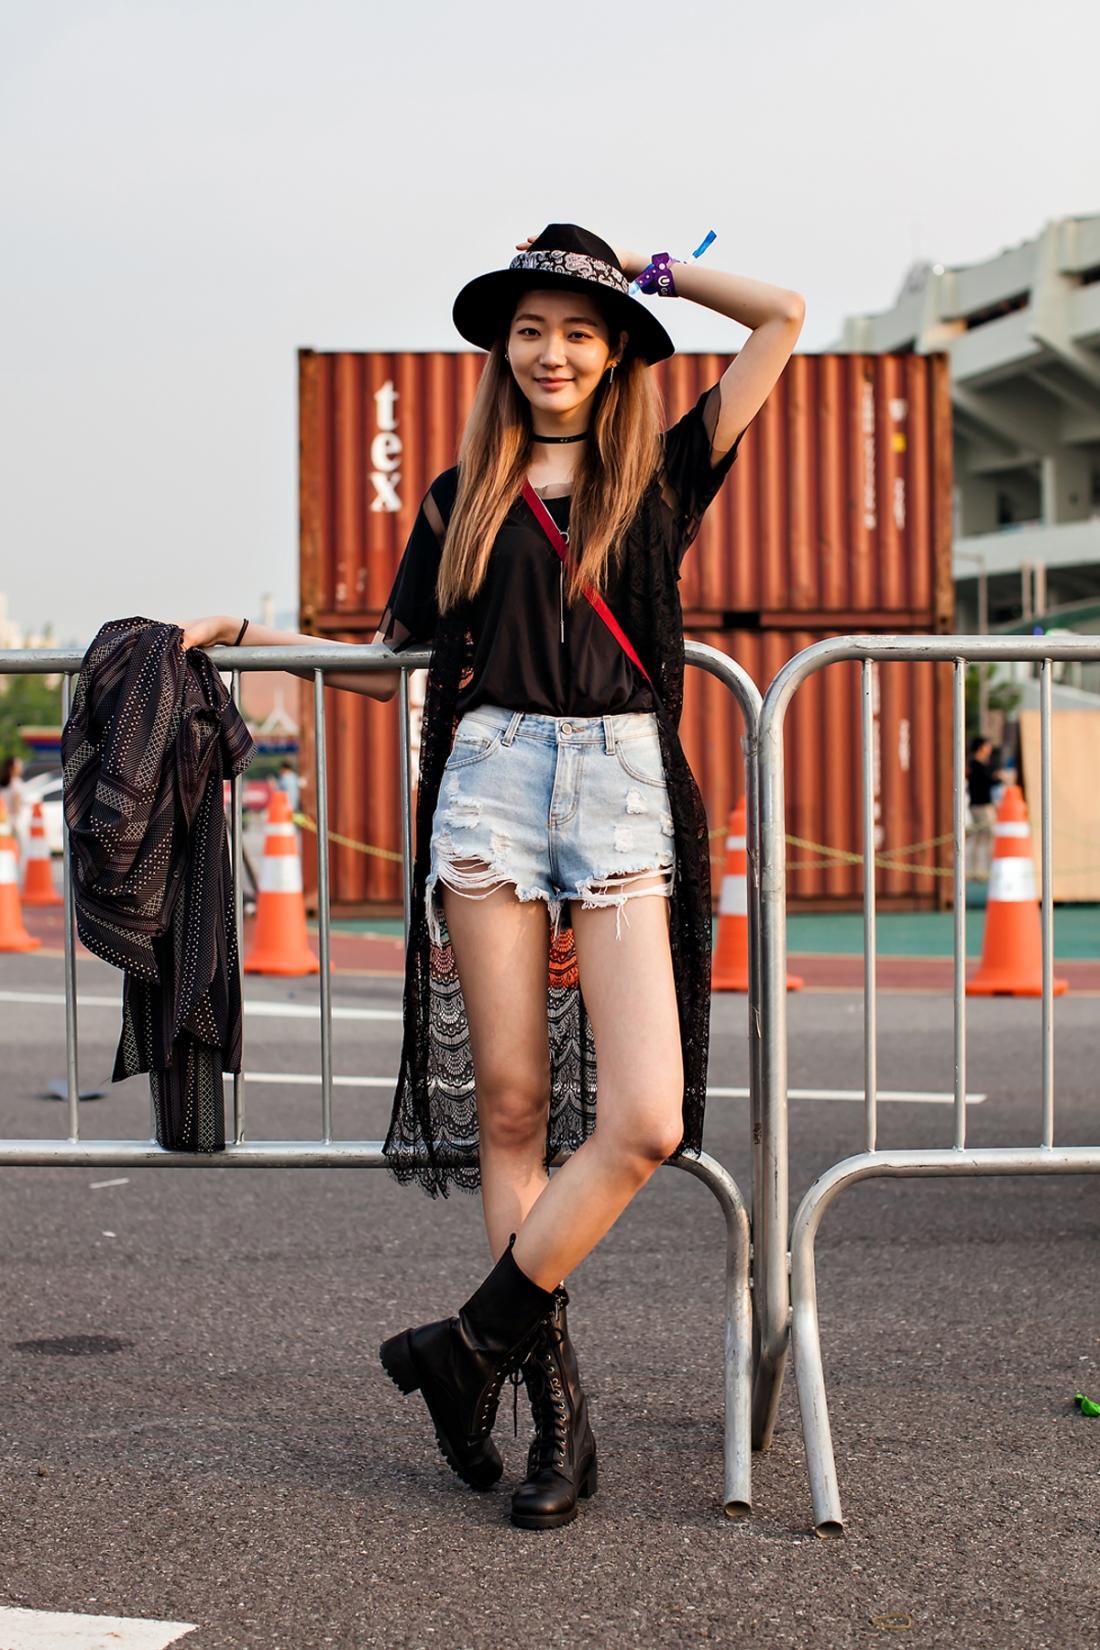 Jung Hyoim, ULTRA MUSIC FESTIVAL KOREA 2016